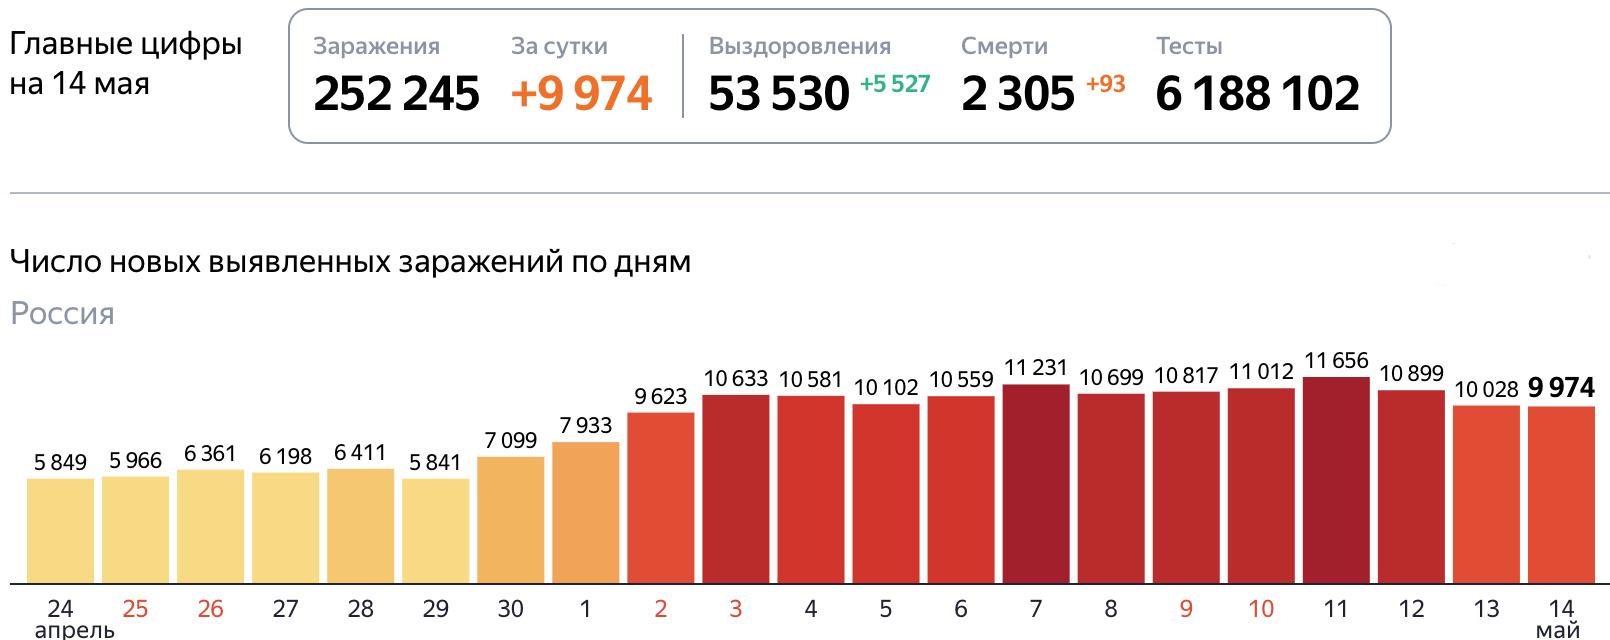 Коронавирус статистика на 14 мая 2020 года в России